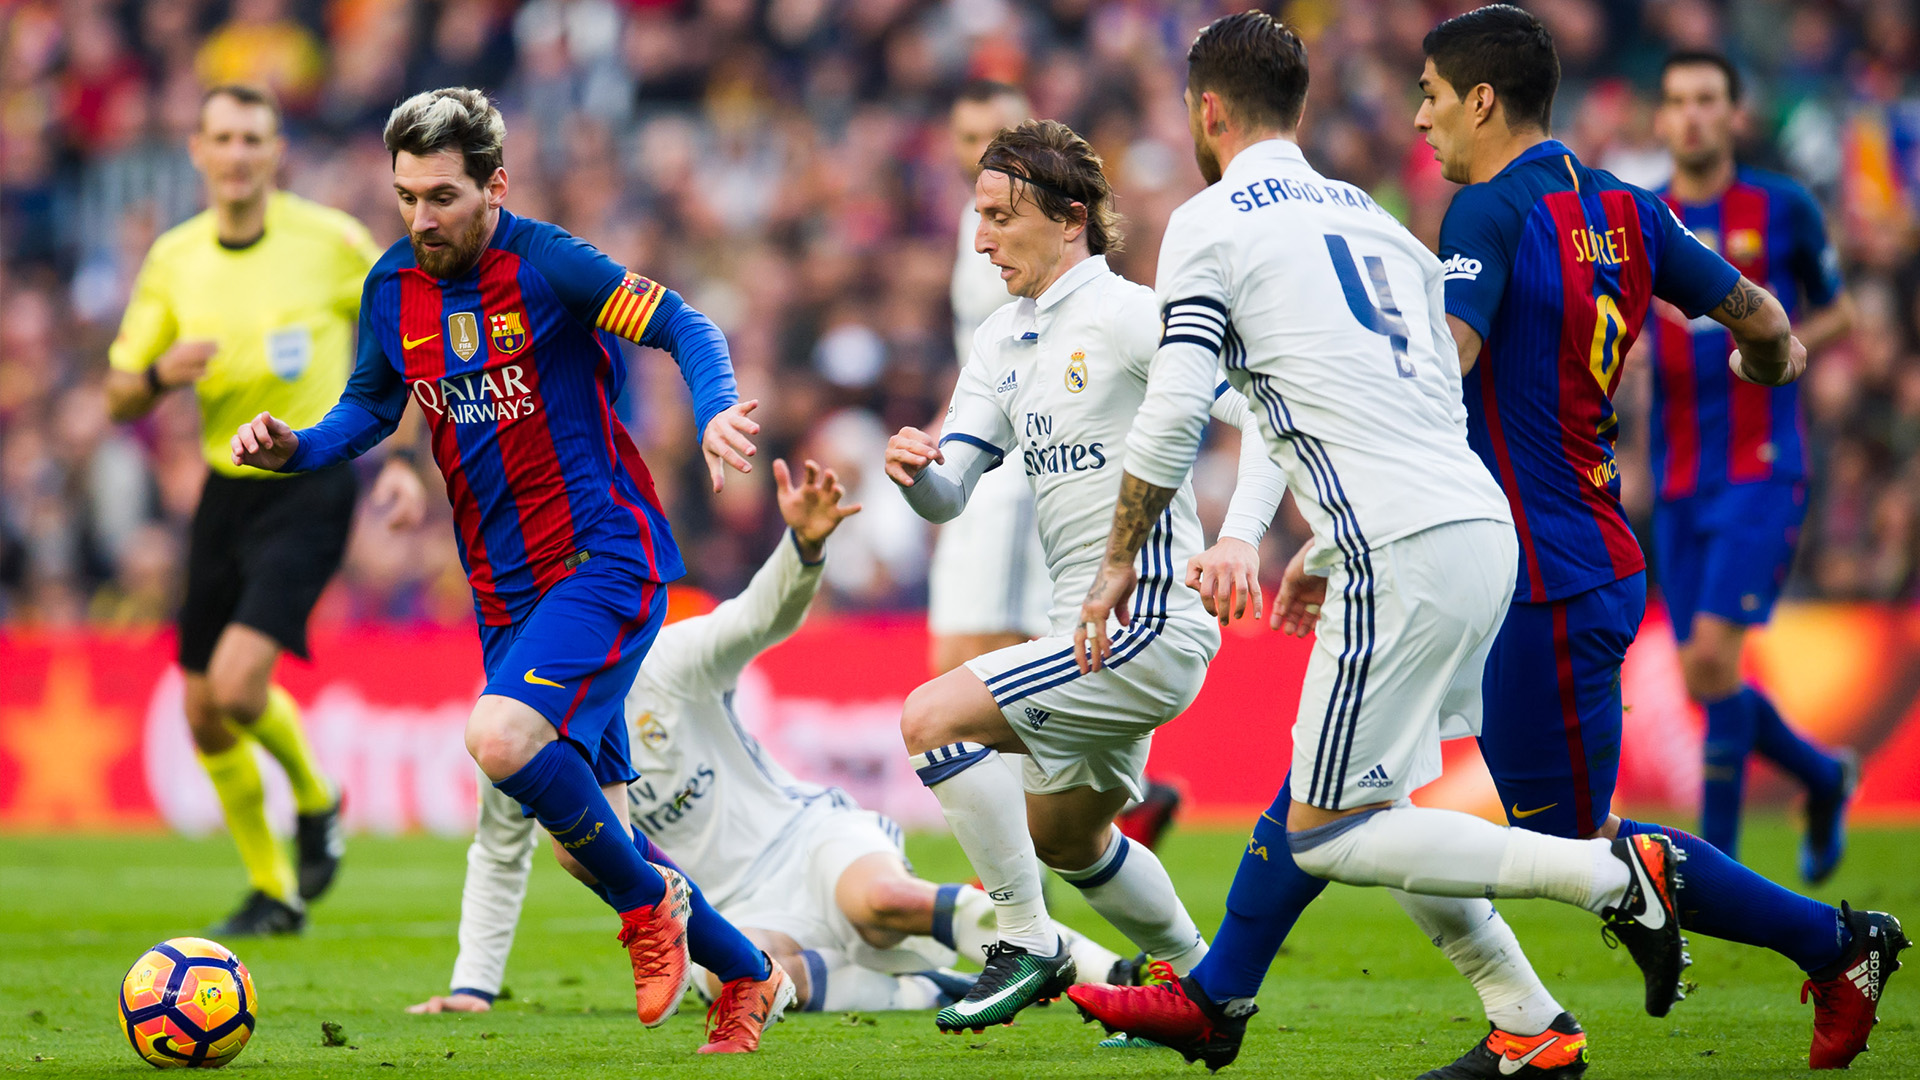 Real Madrid Vs Barcelona El Clasico Wont Decide La Liga Title Race